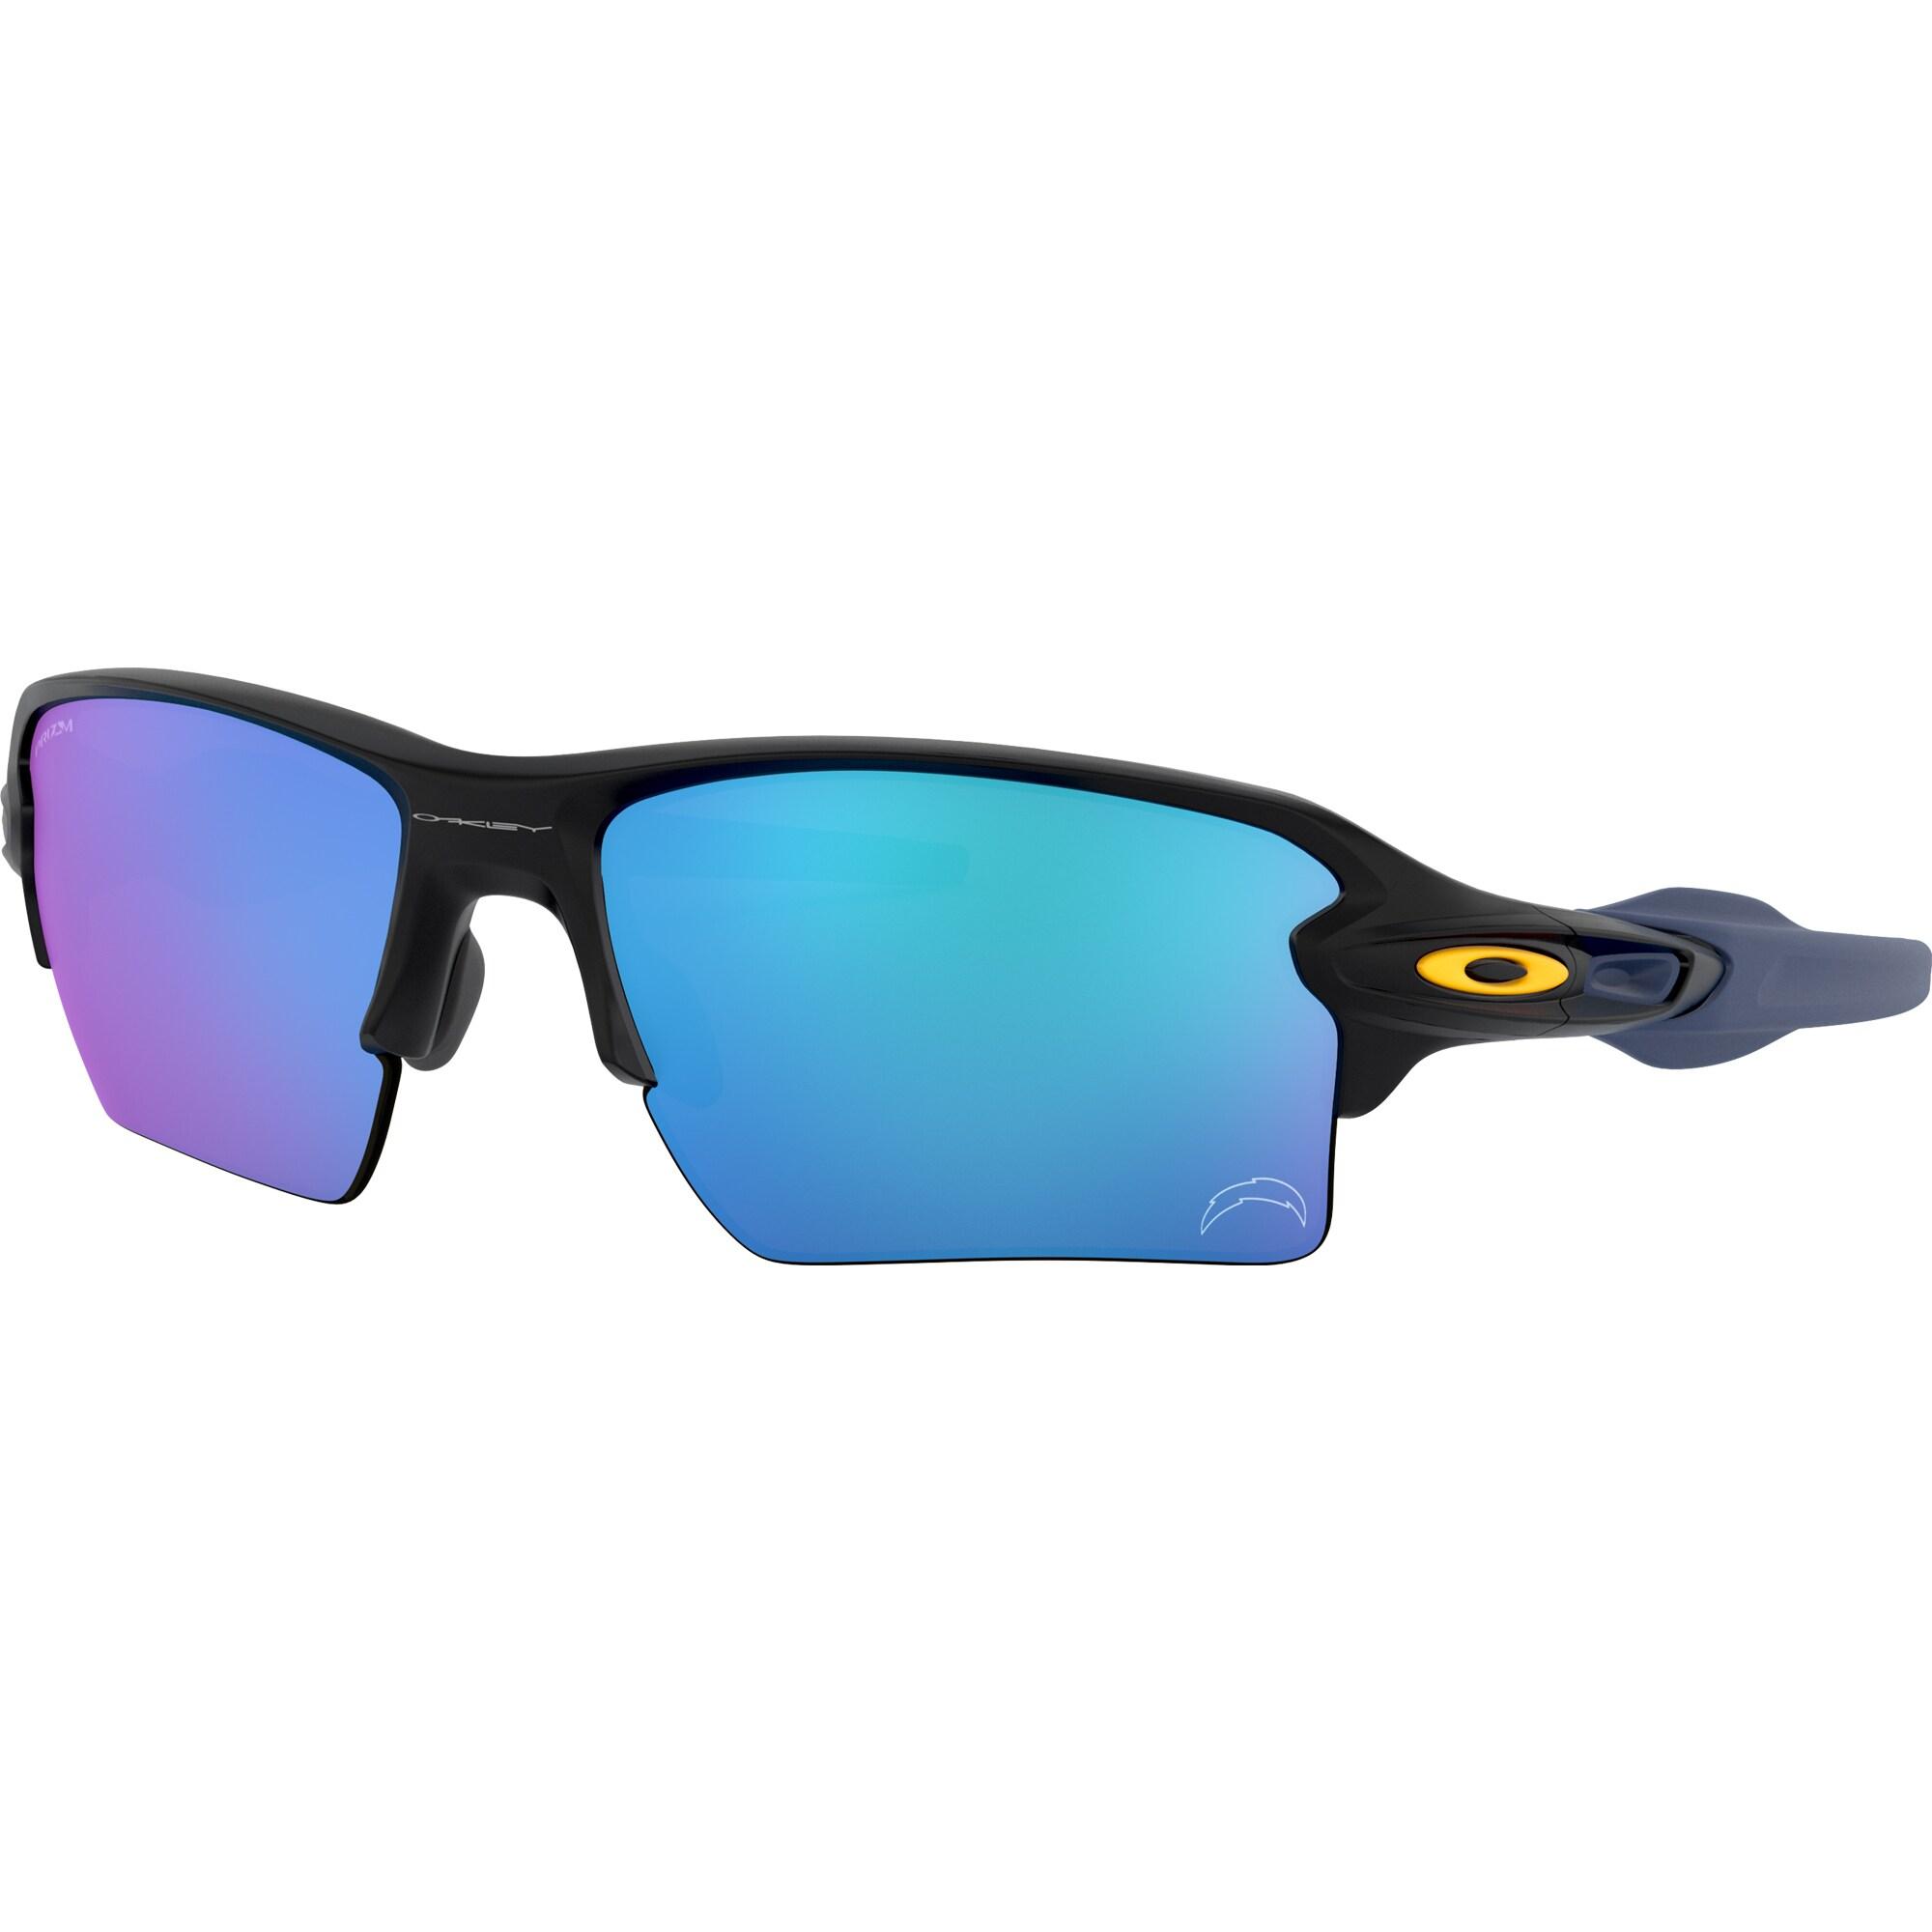 Los Angeles Chargers Oakley Flak 2.0 XL Sunglasses